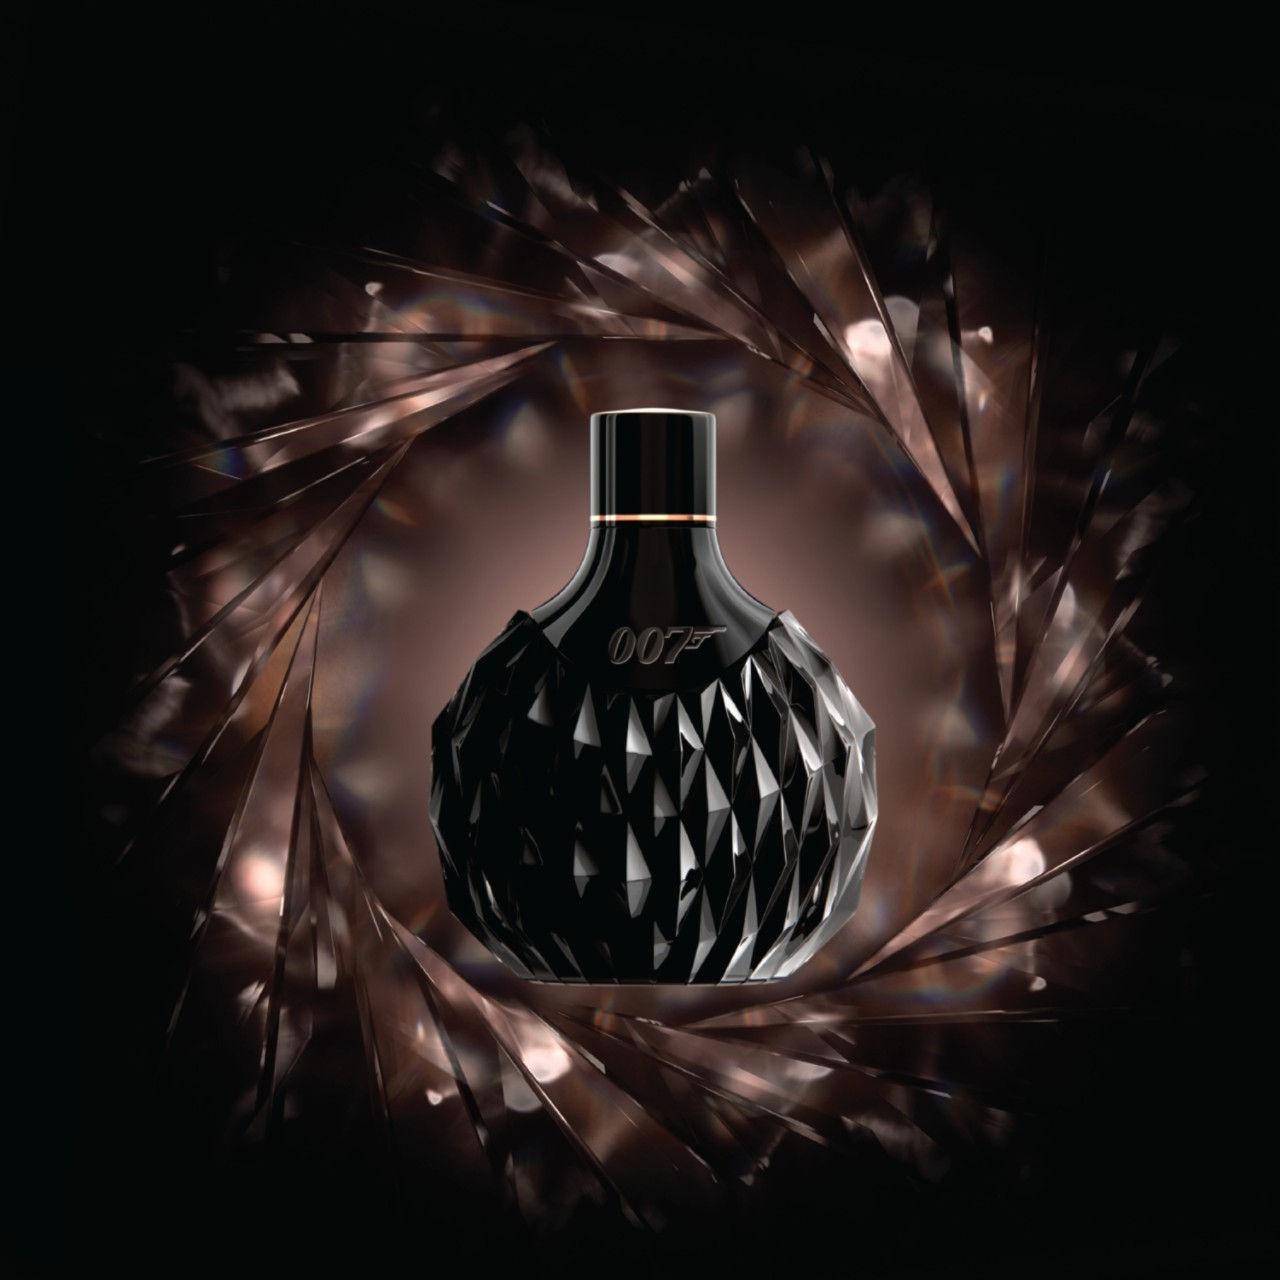 James Bond 007 for Women I Eau de Parfum: Buy James Bond 007 for Women I  Eau de Parfum Online at Best Price in India   Nykaa